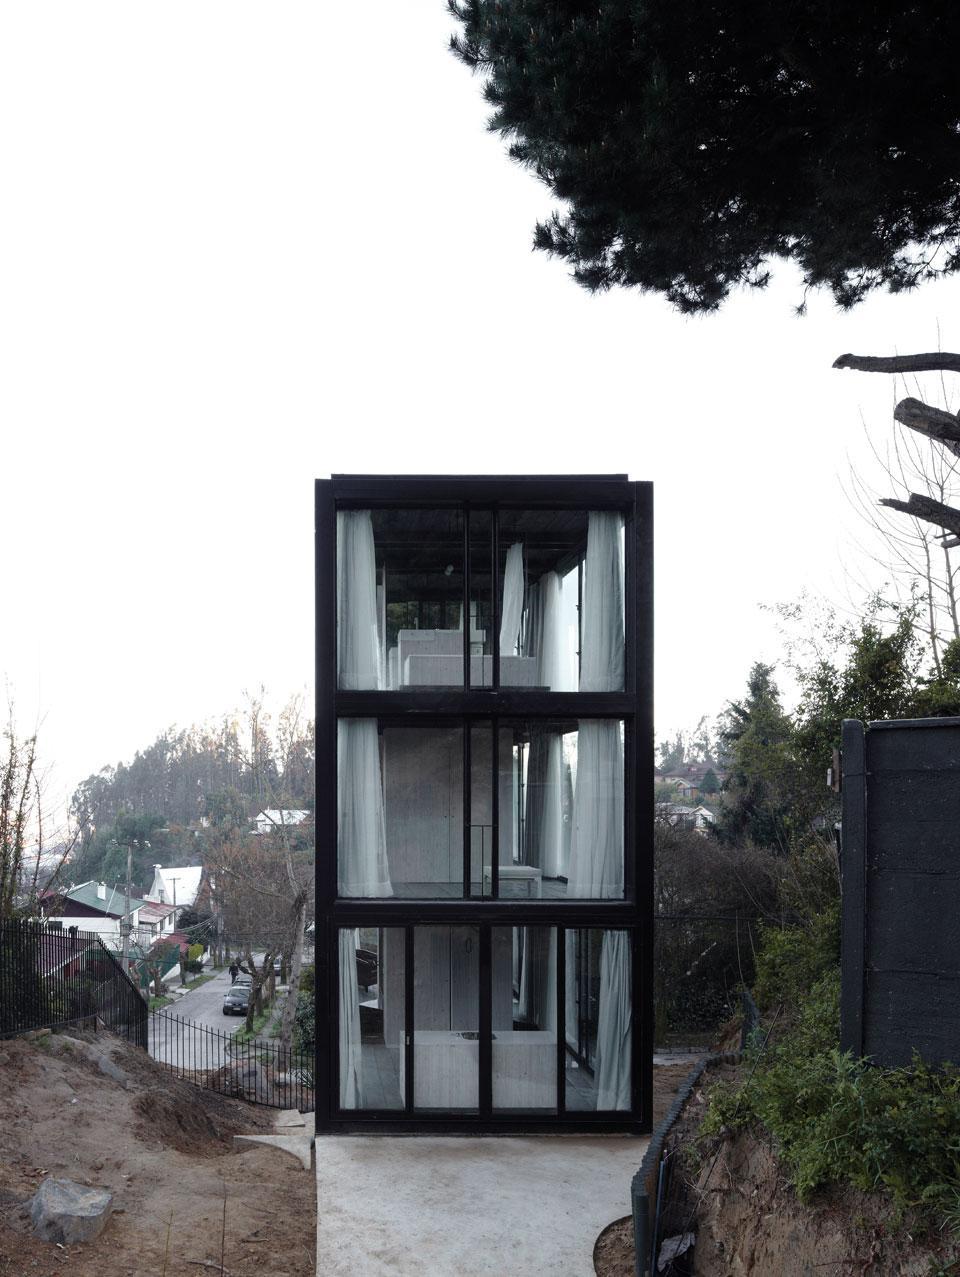 the_tree_mag-arco-house-by-pezo-von-ellrichshausen-40.jpg